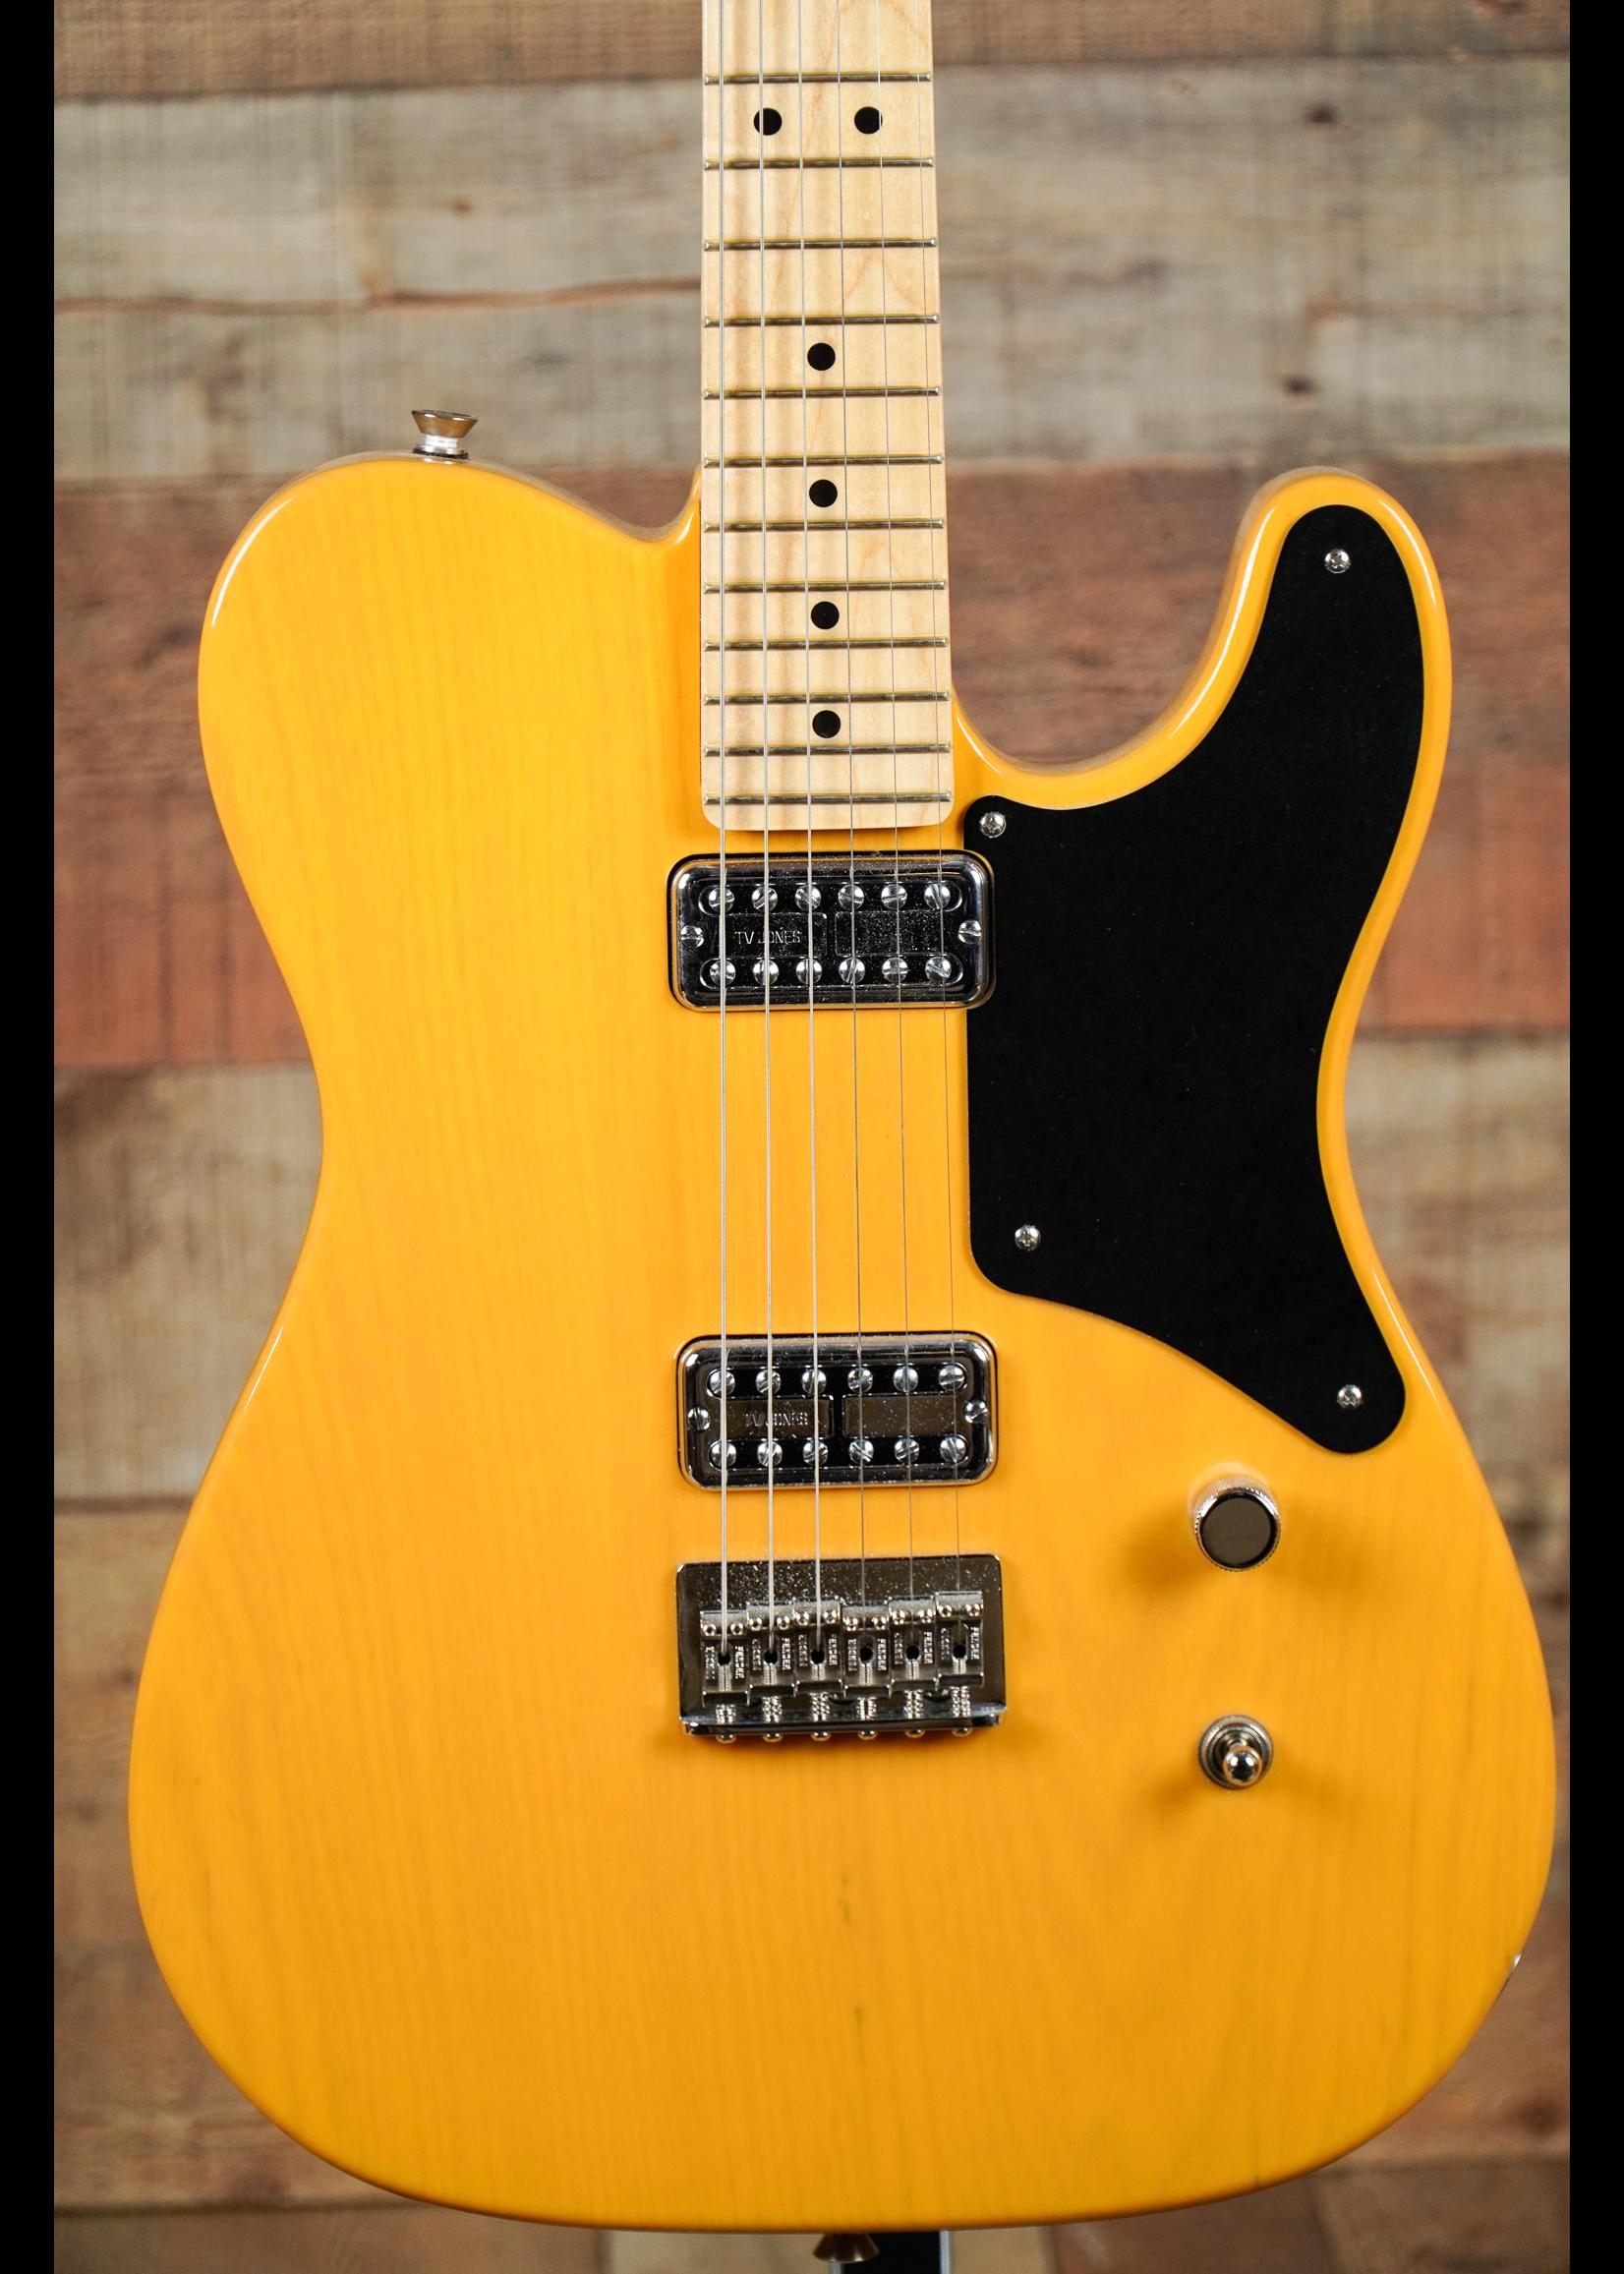 Fender Fender  Limited Edition Cabronita Telecaster®, Maple Fingerboard  Butterscotch Blonde